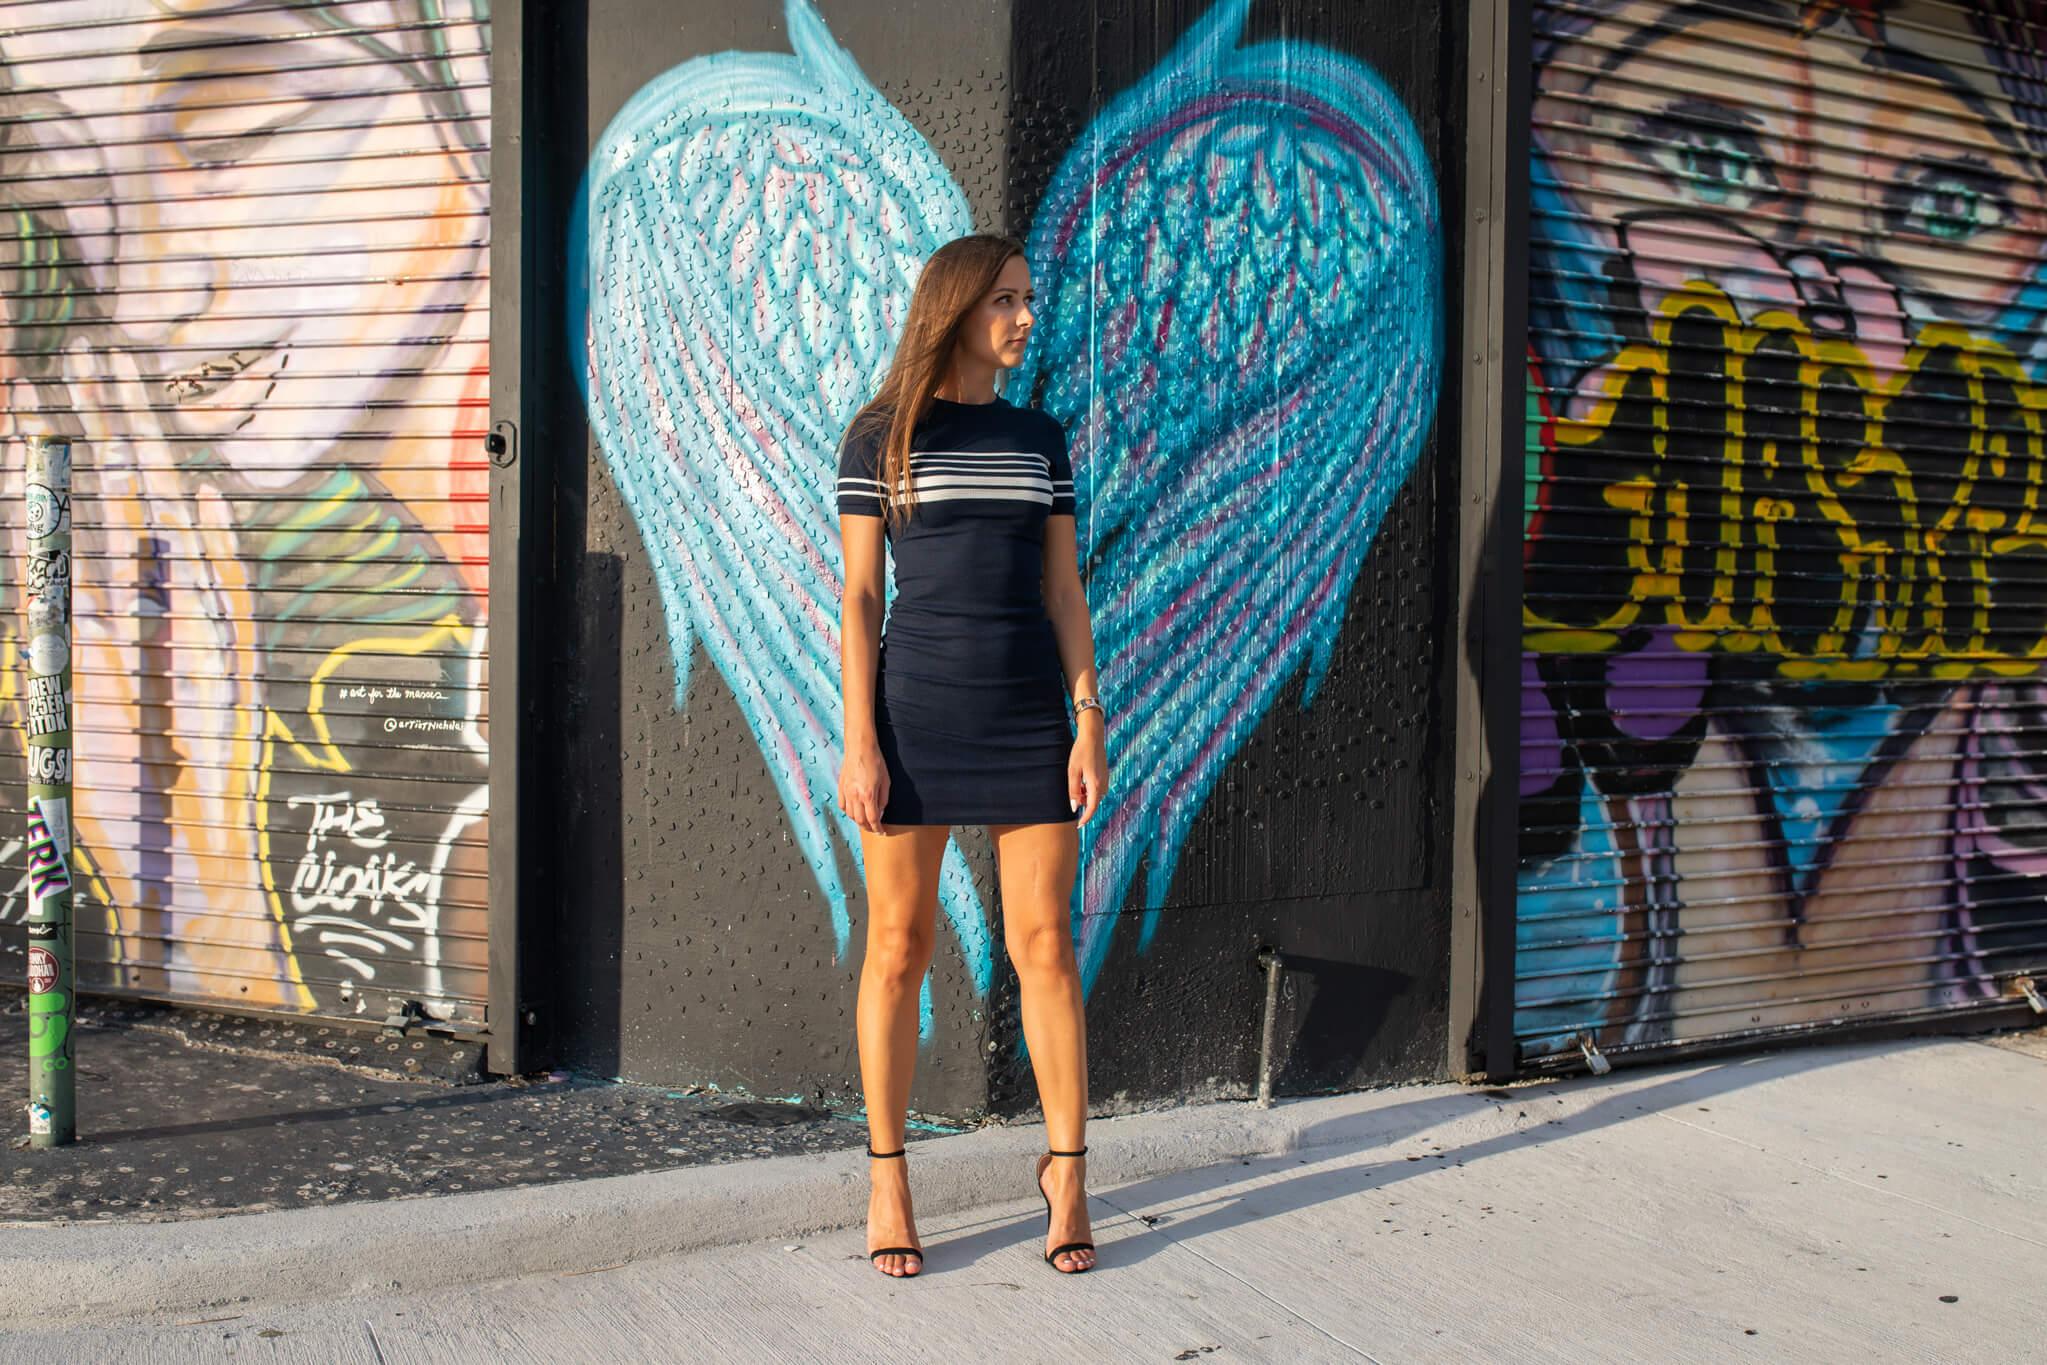 Miami Wynwood Walls Art District - Photoshoot Ideas